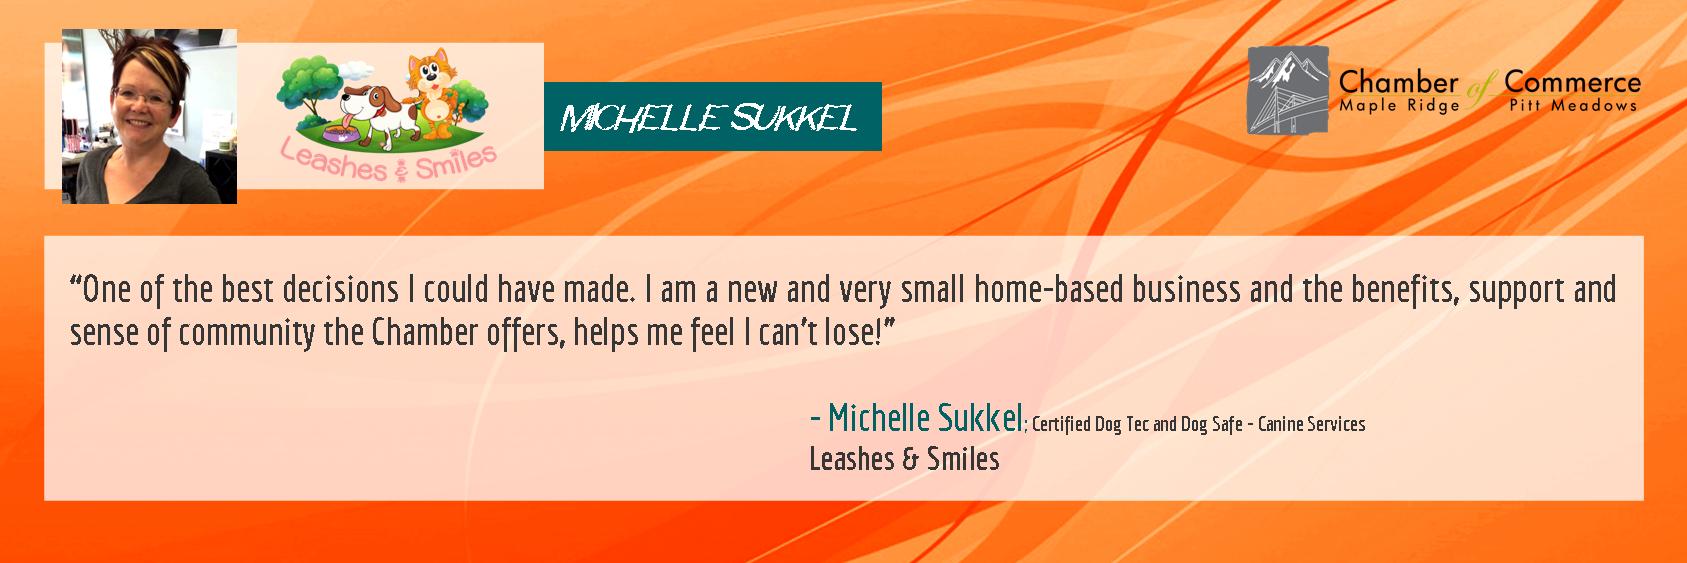 Michelle_Sukkel(1).png